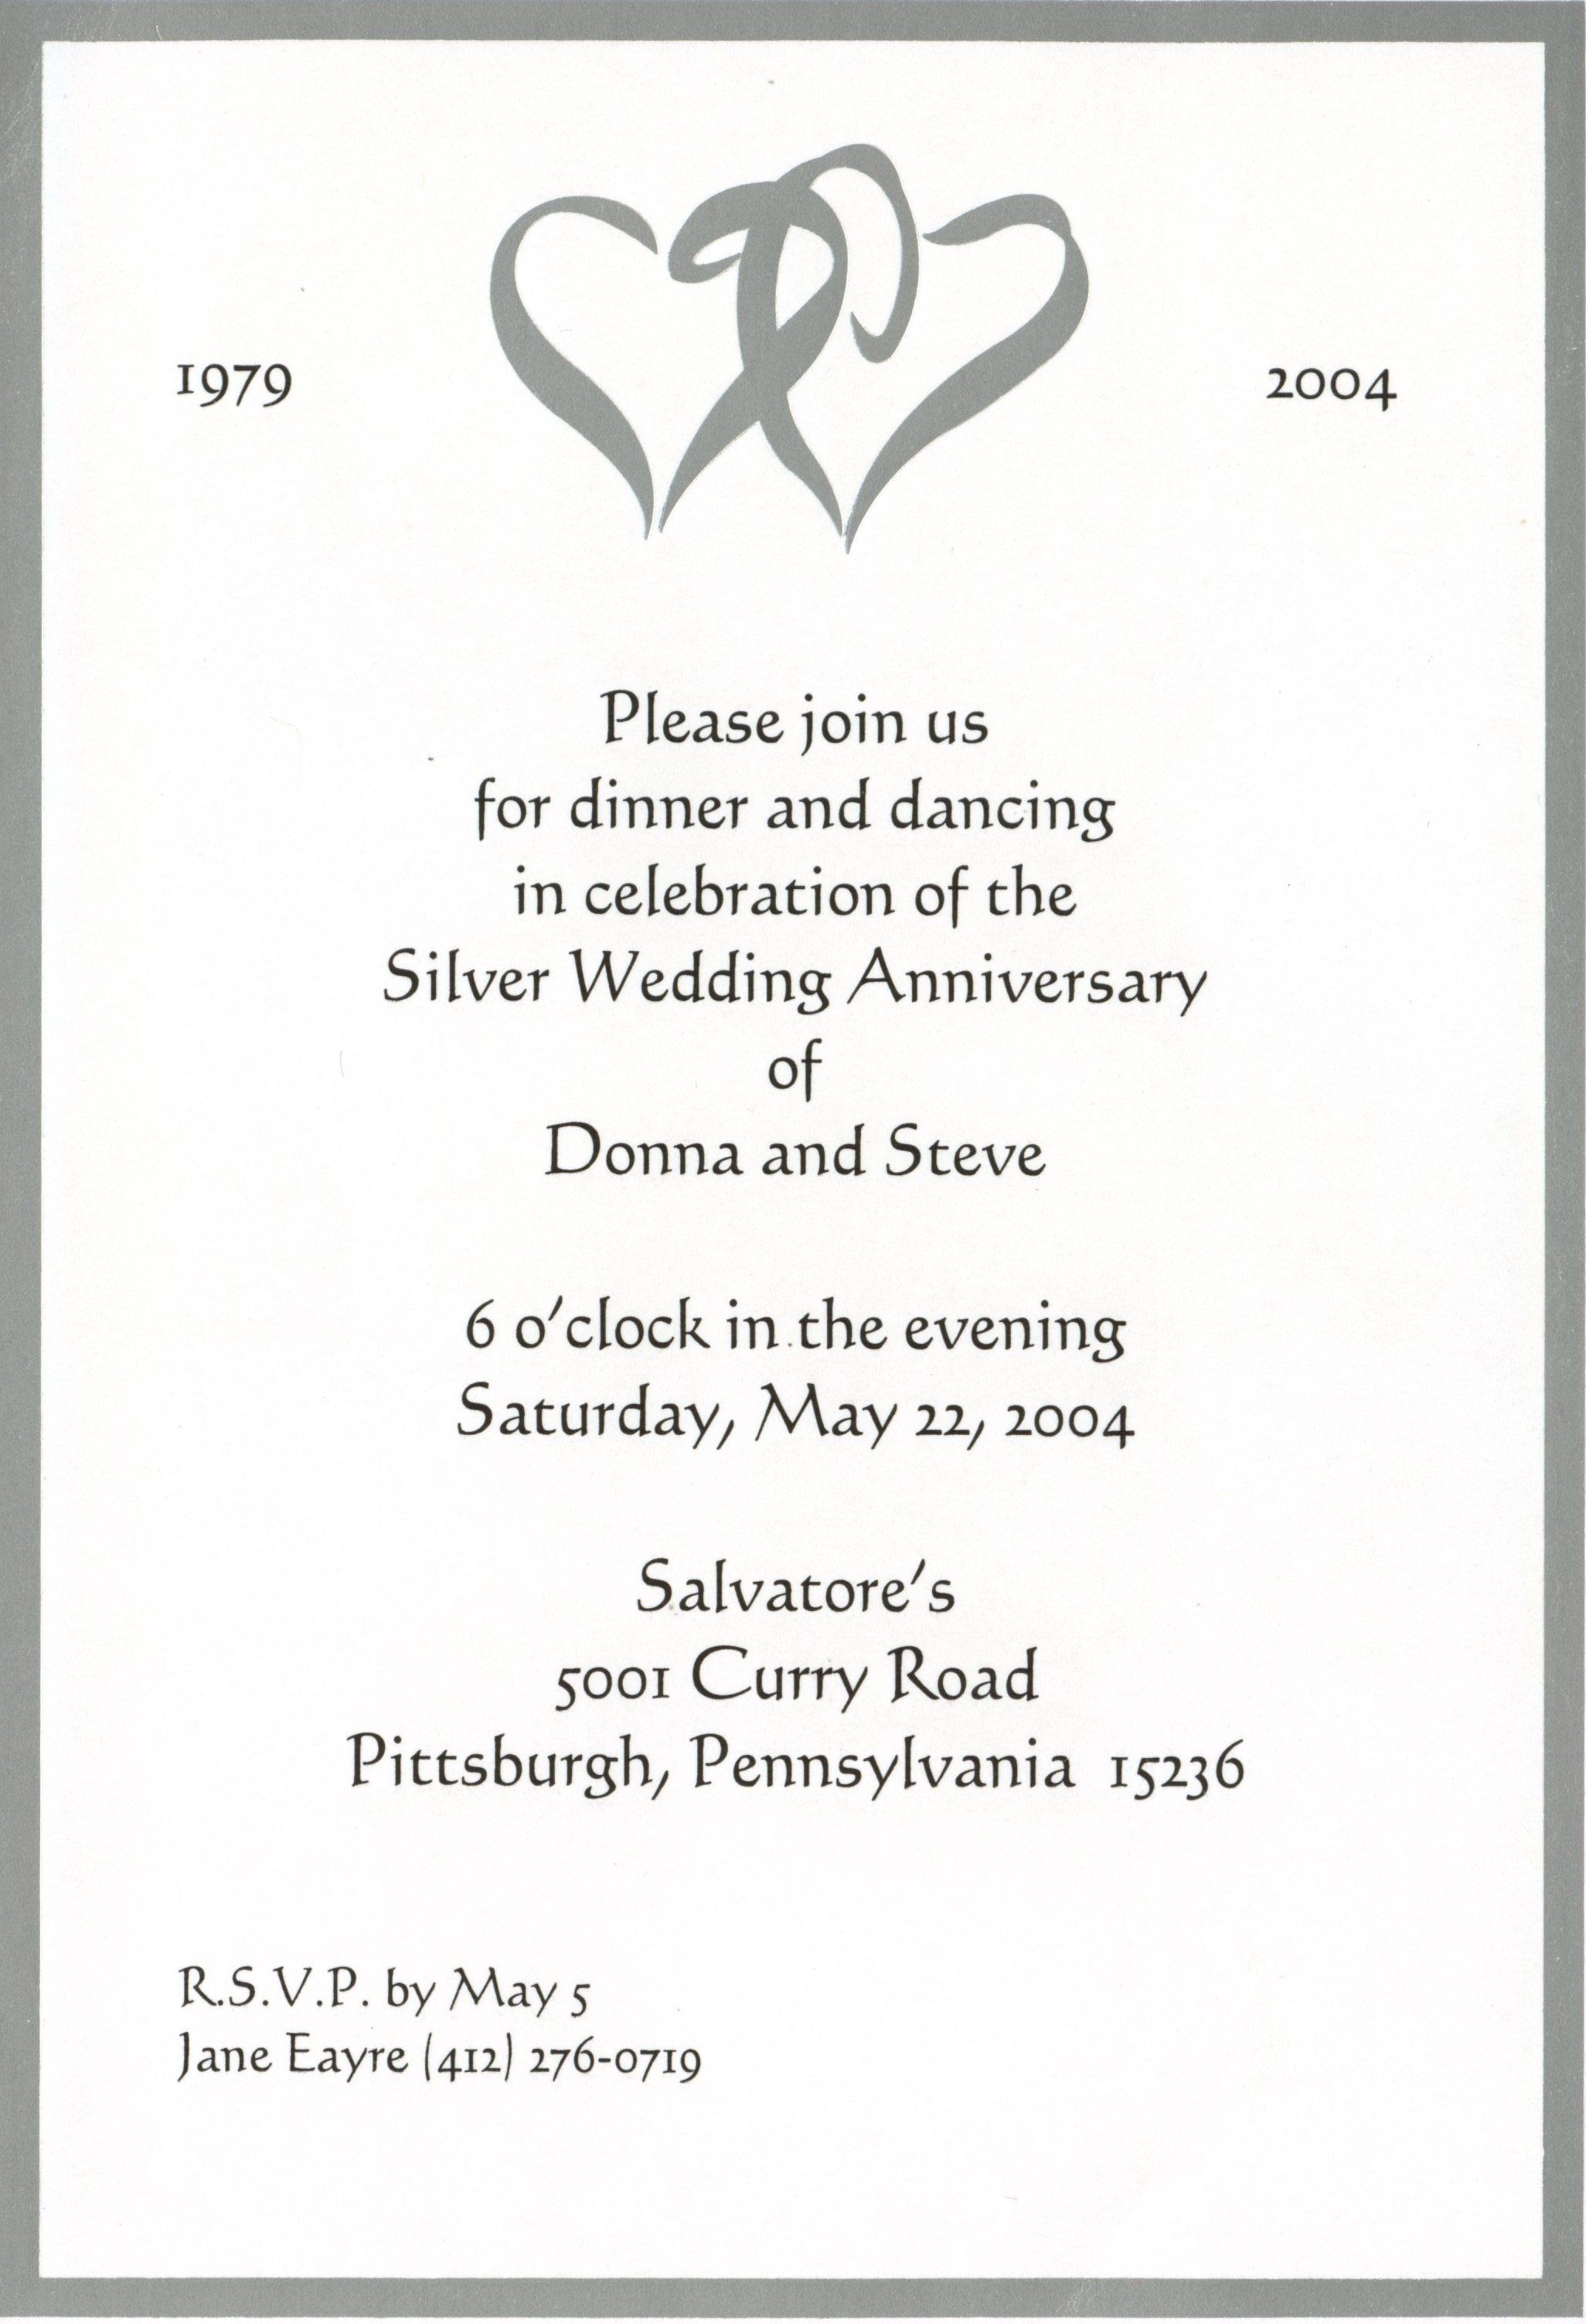 50th Wedding Anniversary Invitation Templates Awesome